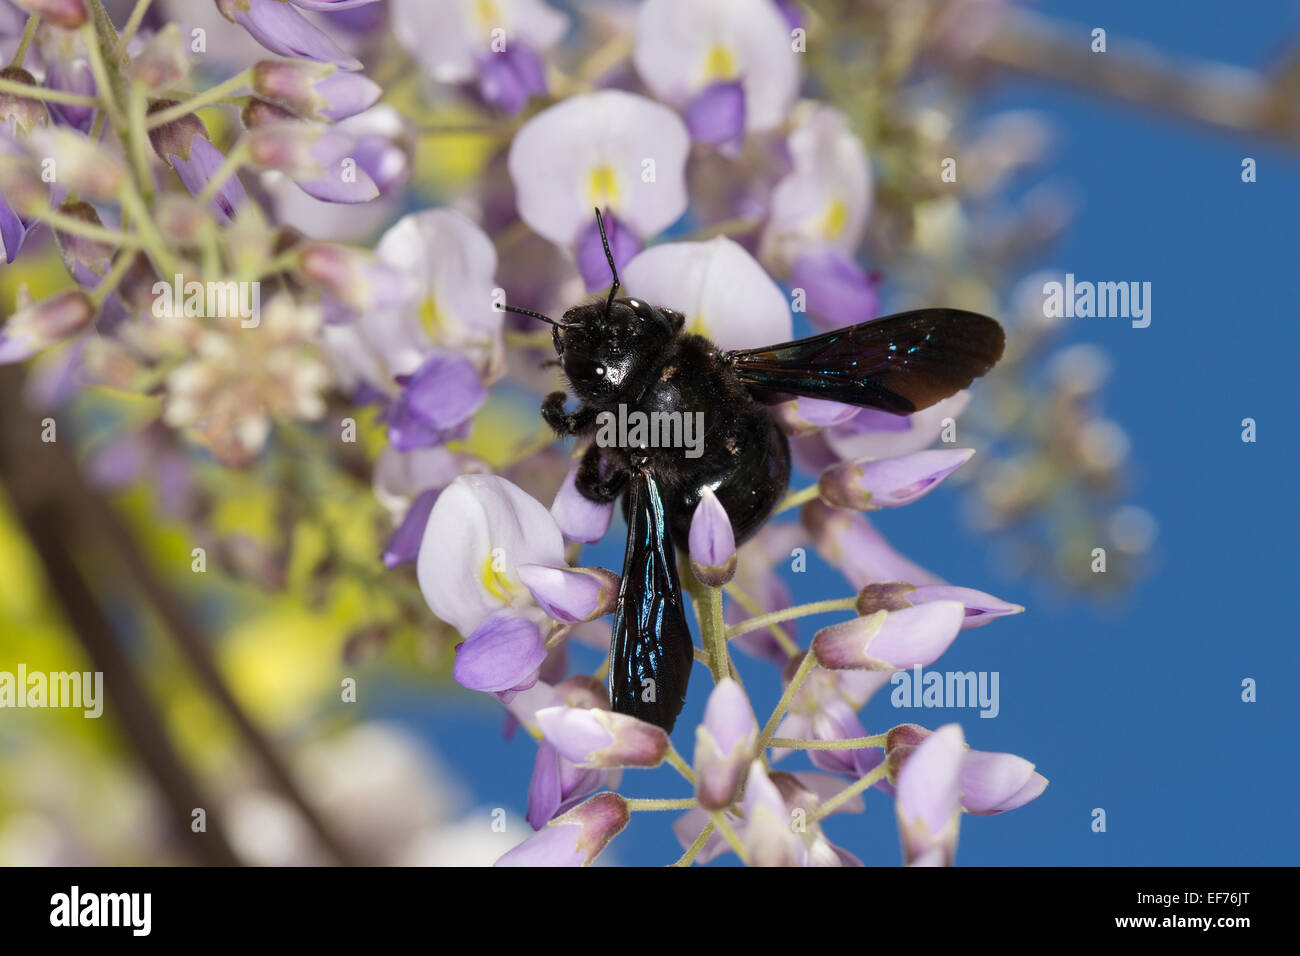 Violet carpenter bee, Indian Bhanvra, Blaue Holzbiene, Blauschwarze Holzbiene, Große Holzbiene, Blütenbesuch, - Stock Image